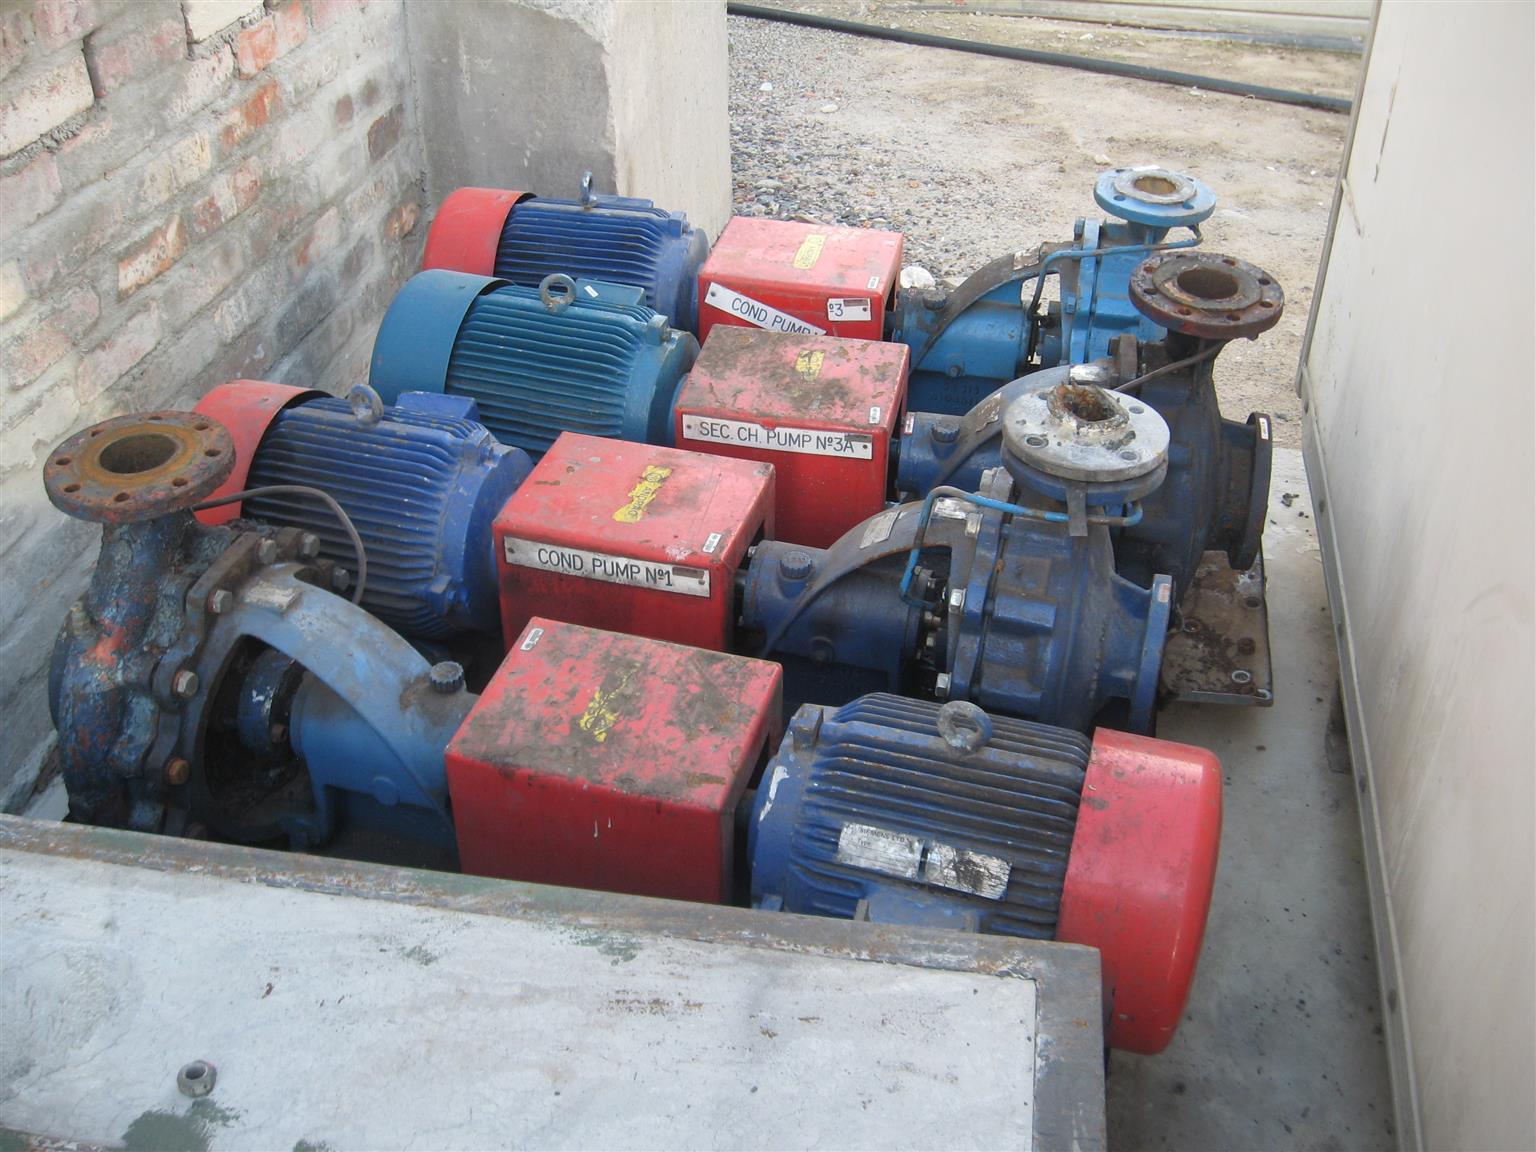 Water Pumps at Bargain Price